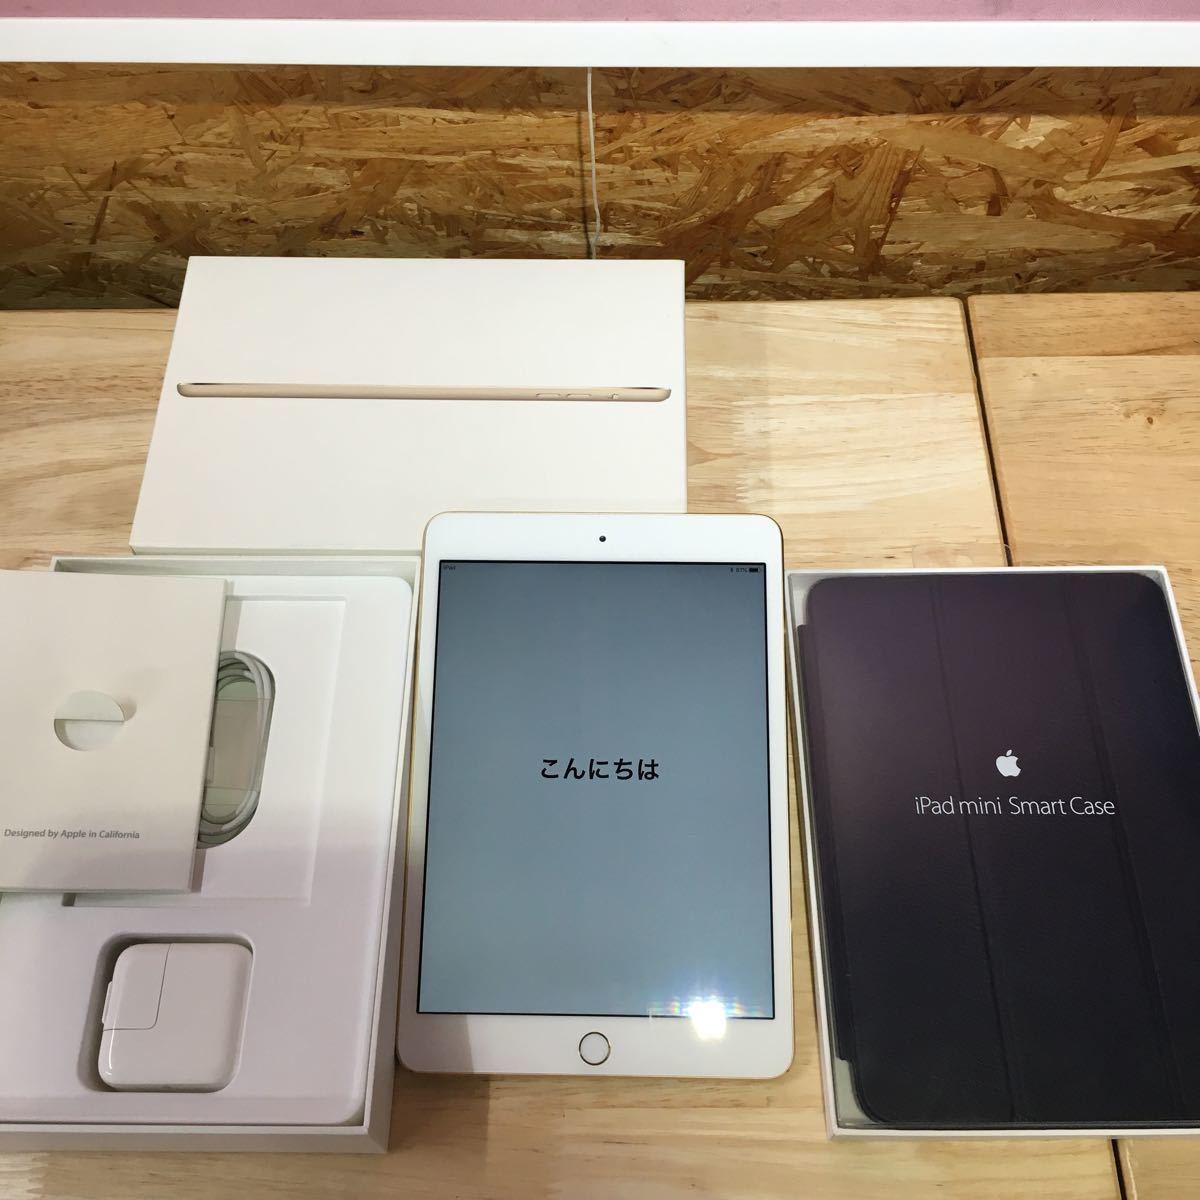 Apple iPad mini 3 Wi-Fi 16GB MGYE2J/A ゴールド 純正レザーケース 紺色 使用感少ない美品